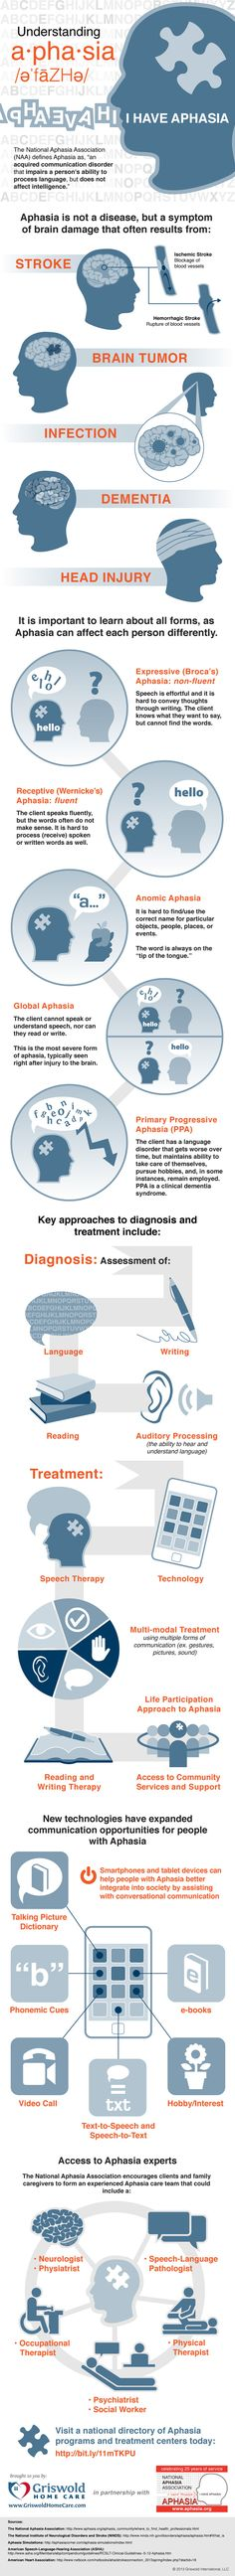 Infographic: Understanding Aphasia